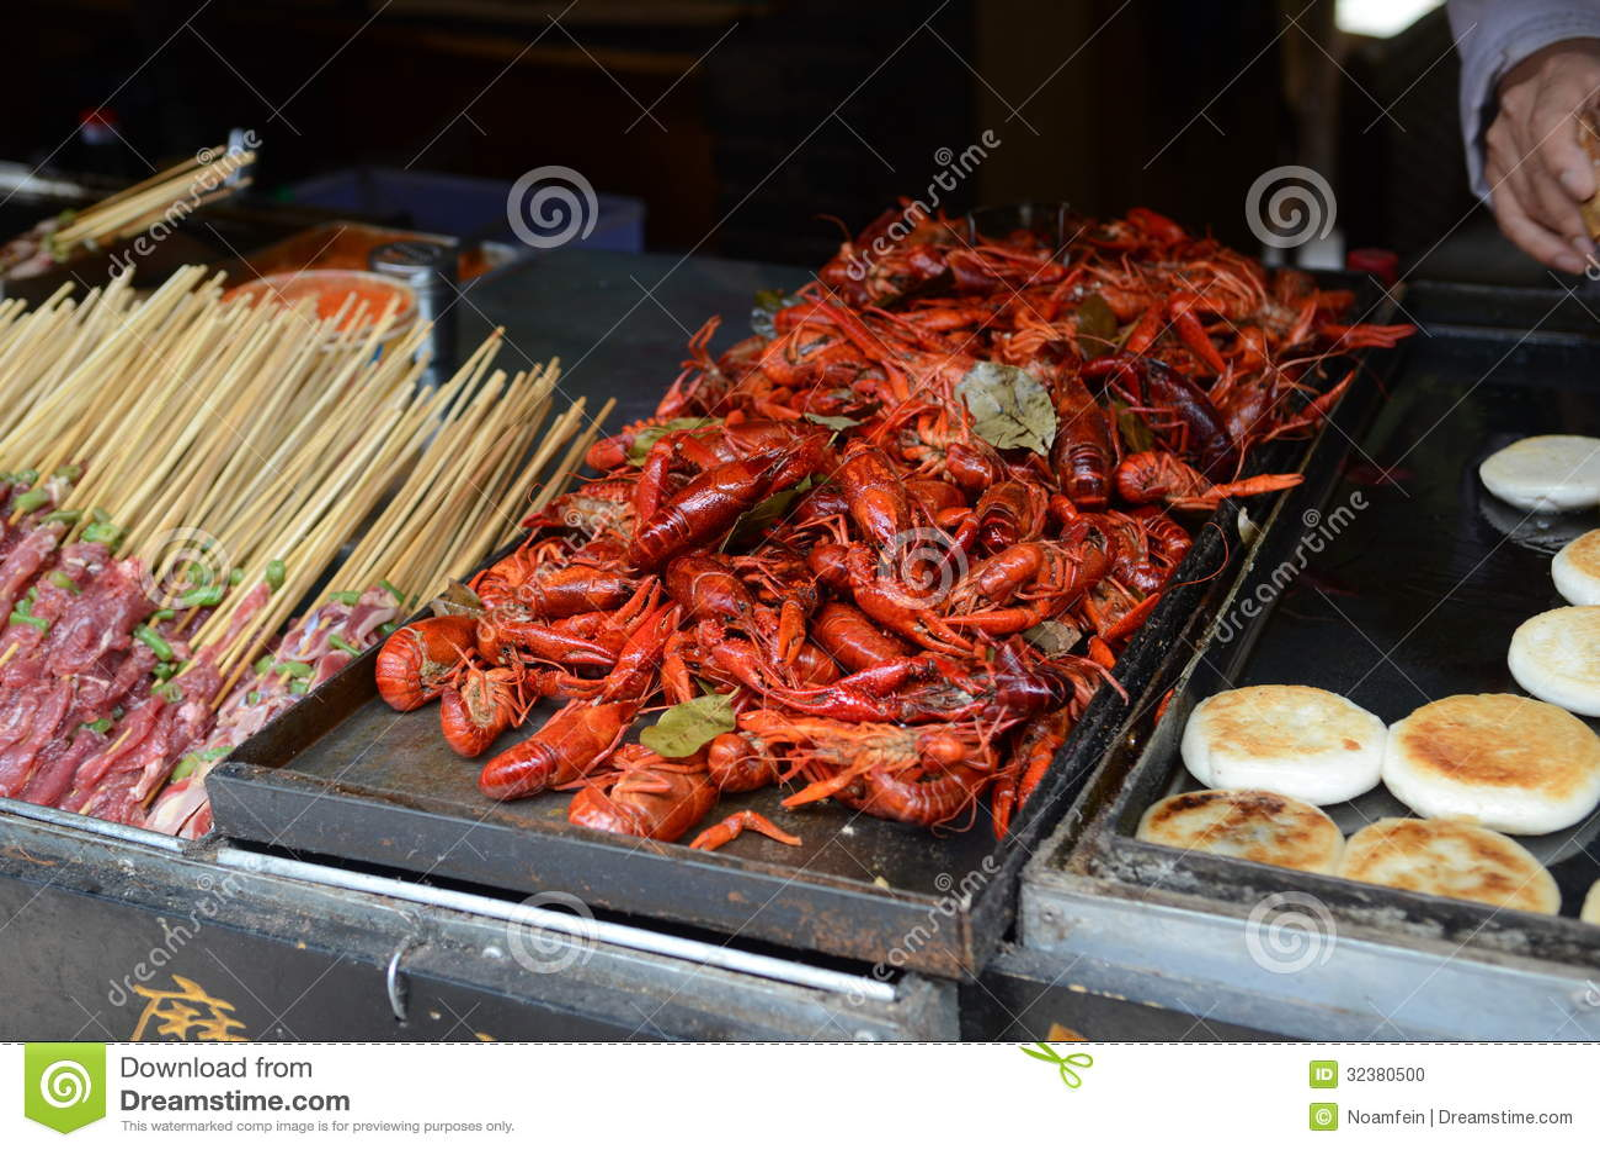 Chinese street food stands in lijiang yunnan china